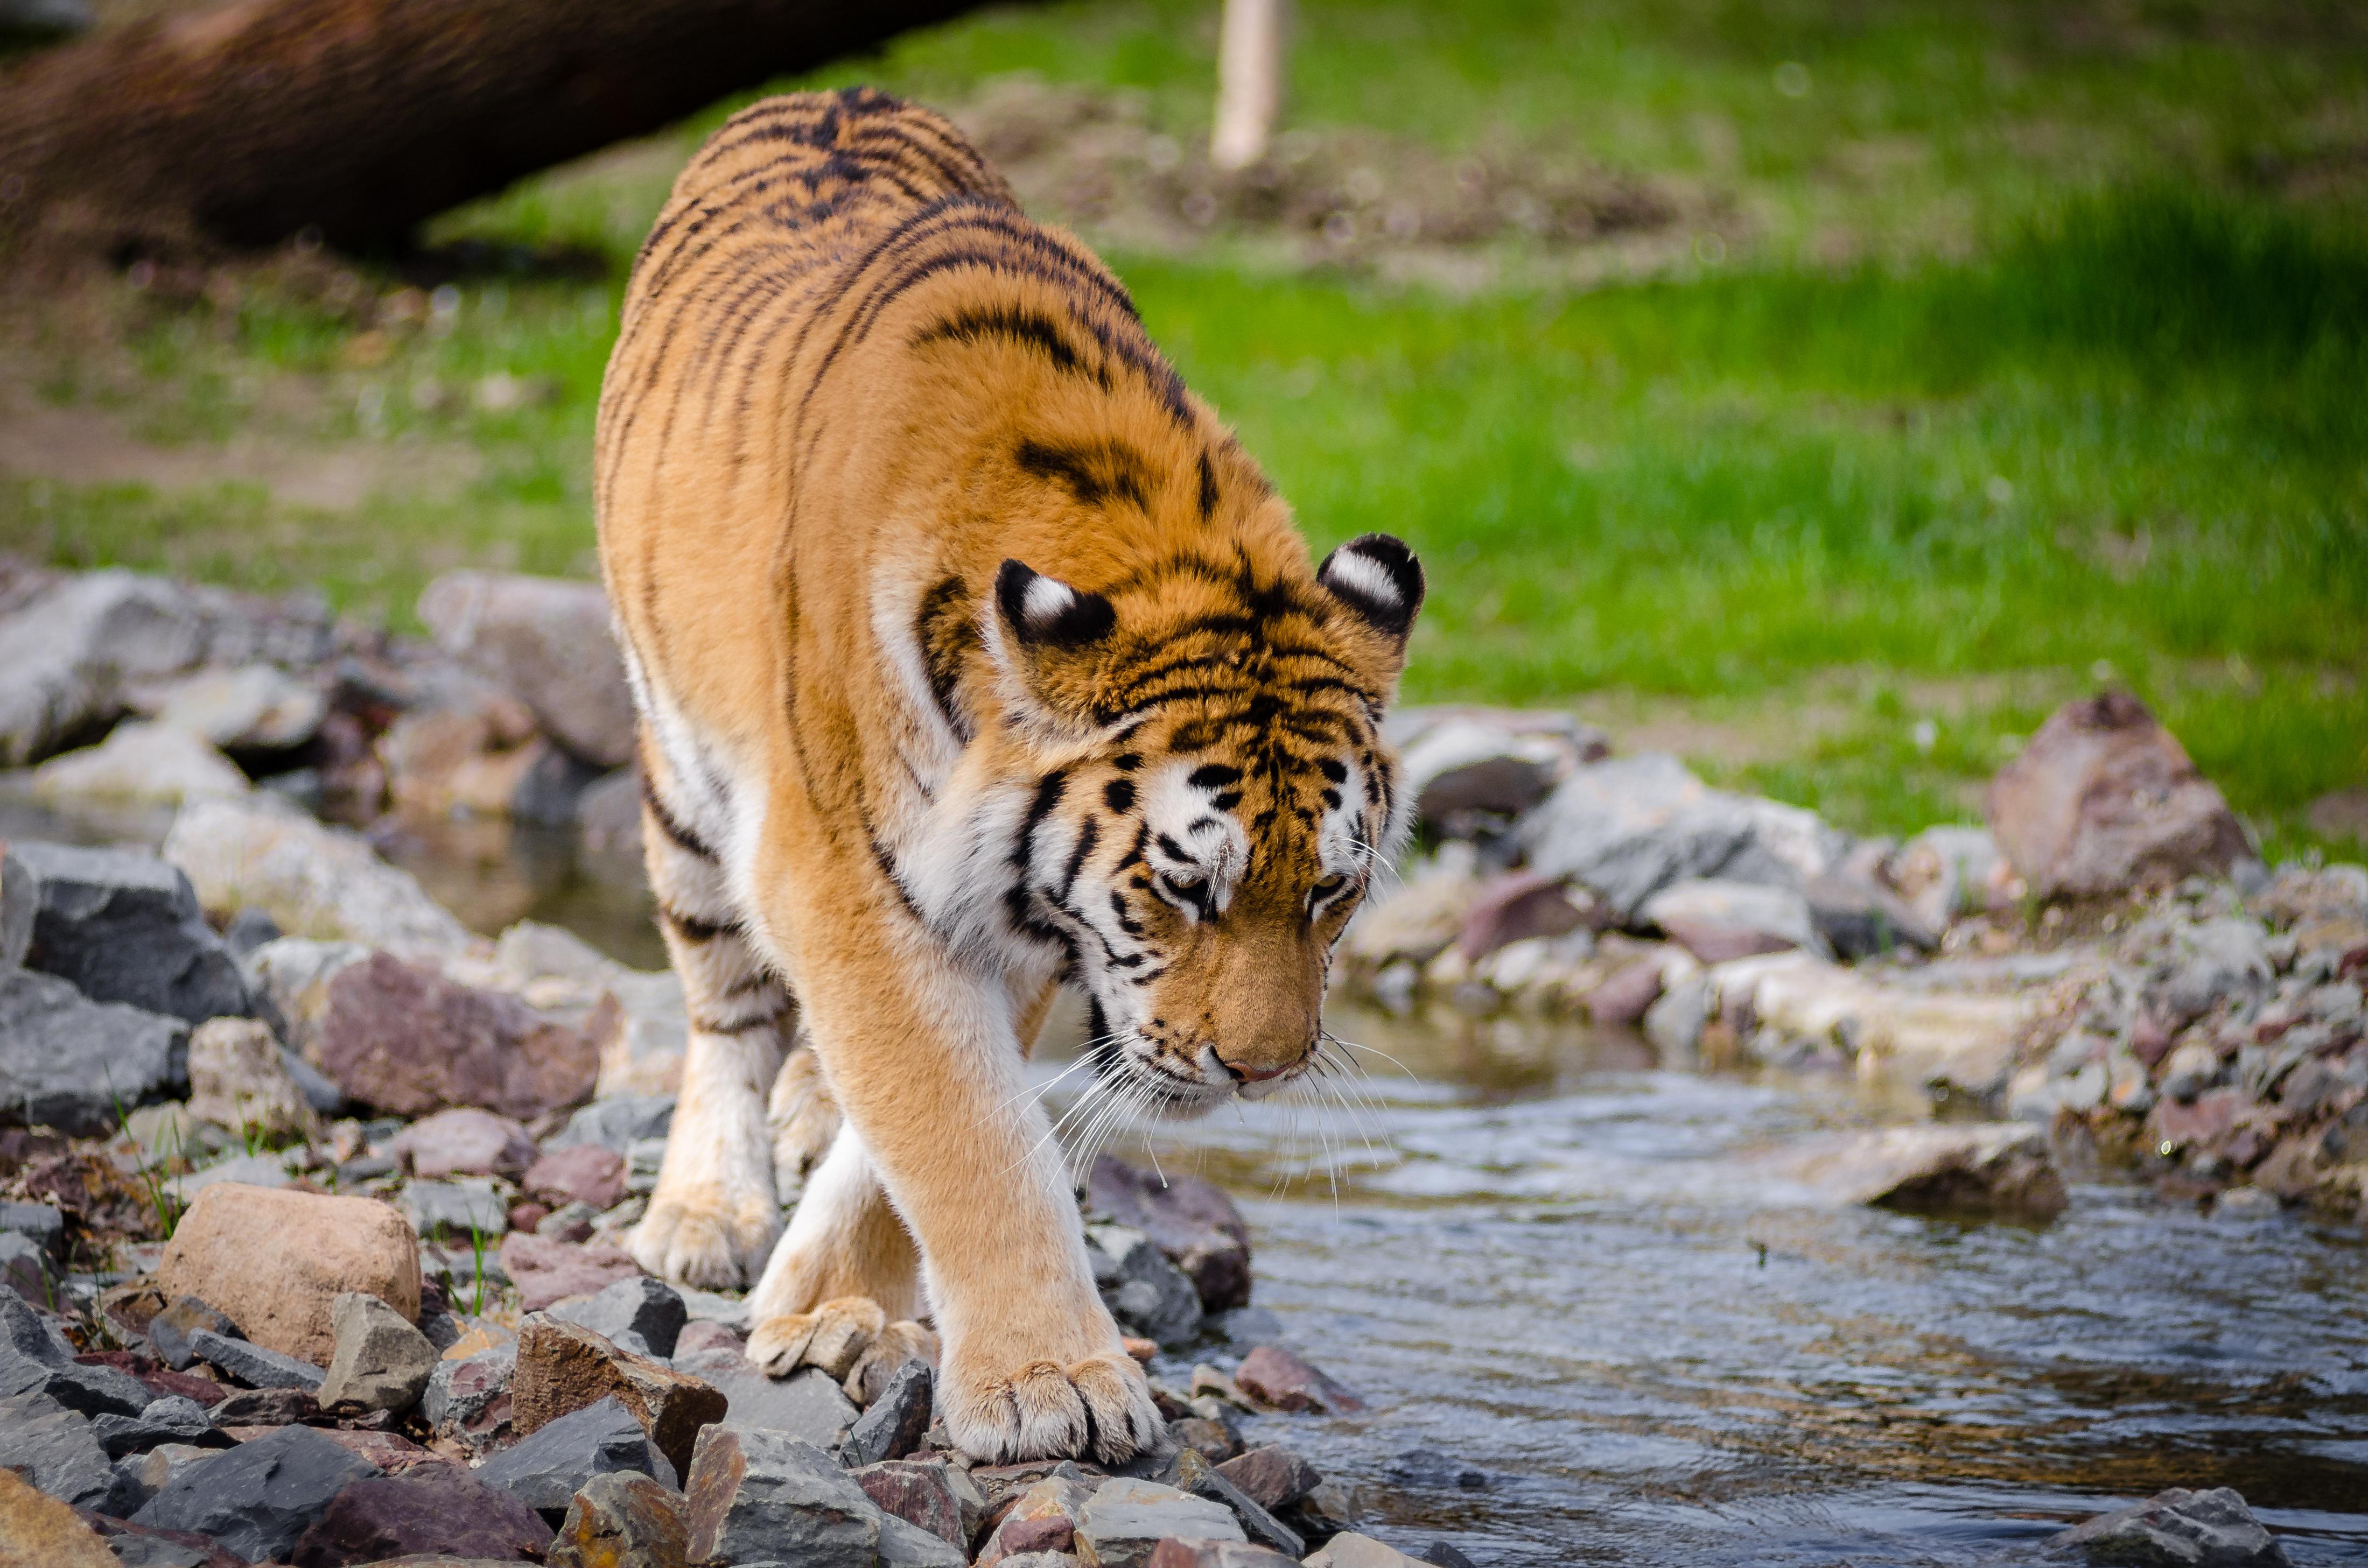 Safari in India: A lone tiger walks through a small creek